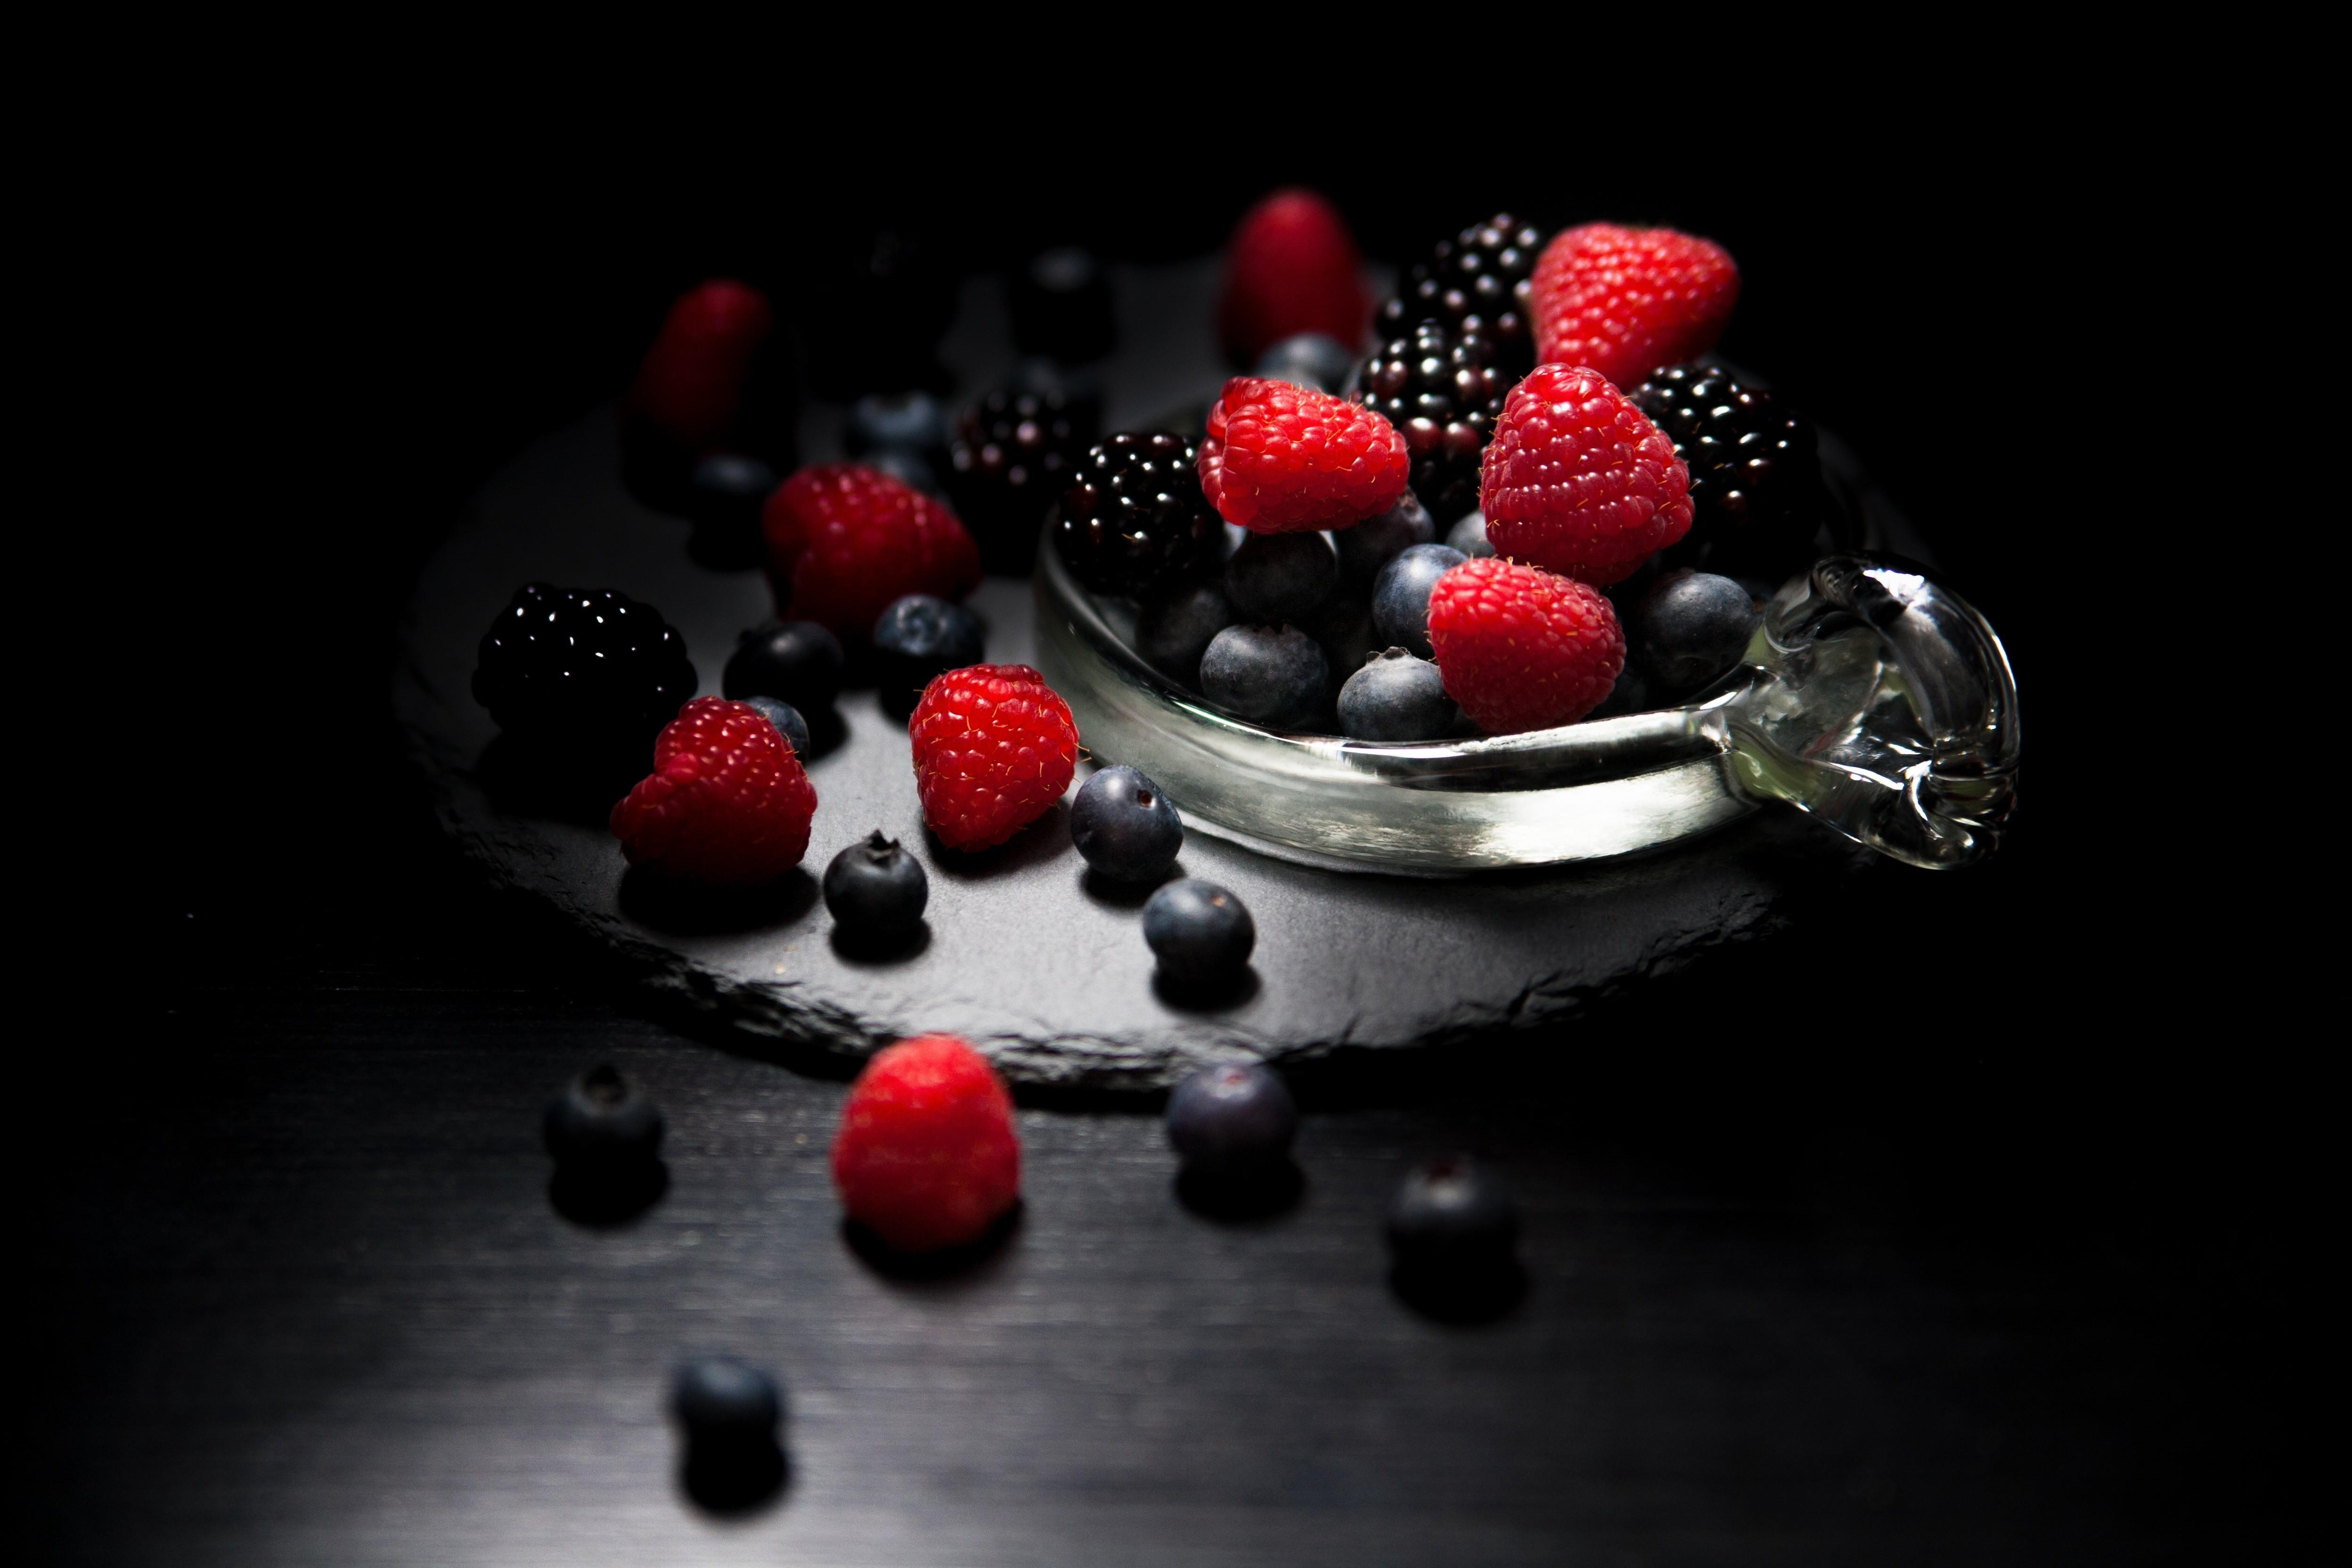 Dark mood, food, fruits, blueberry, raspberry, blackberry, 4k